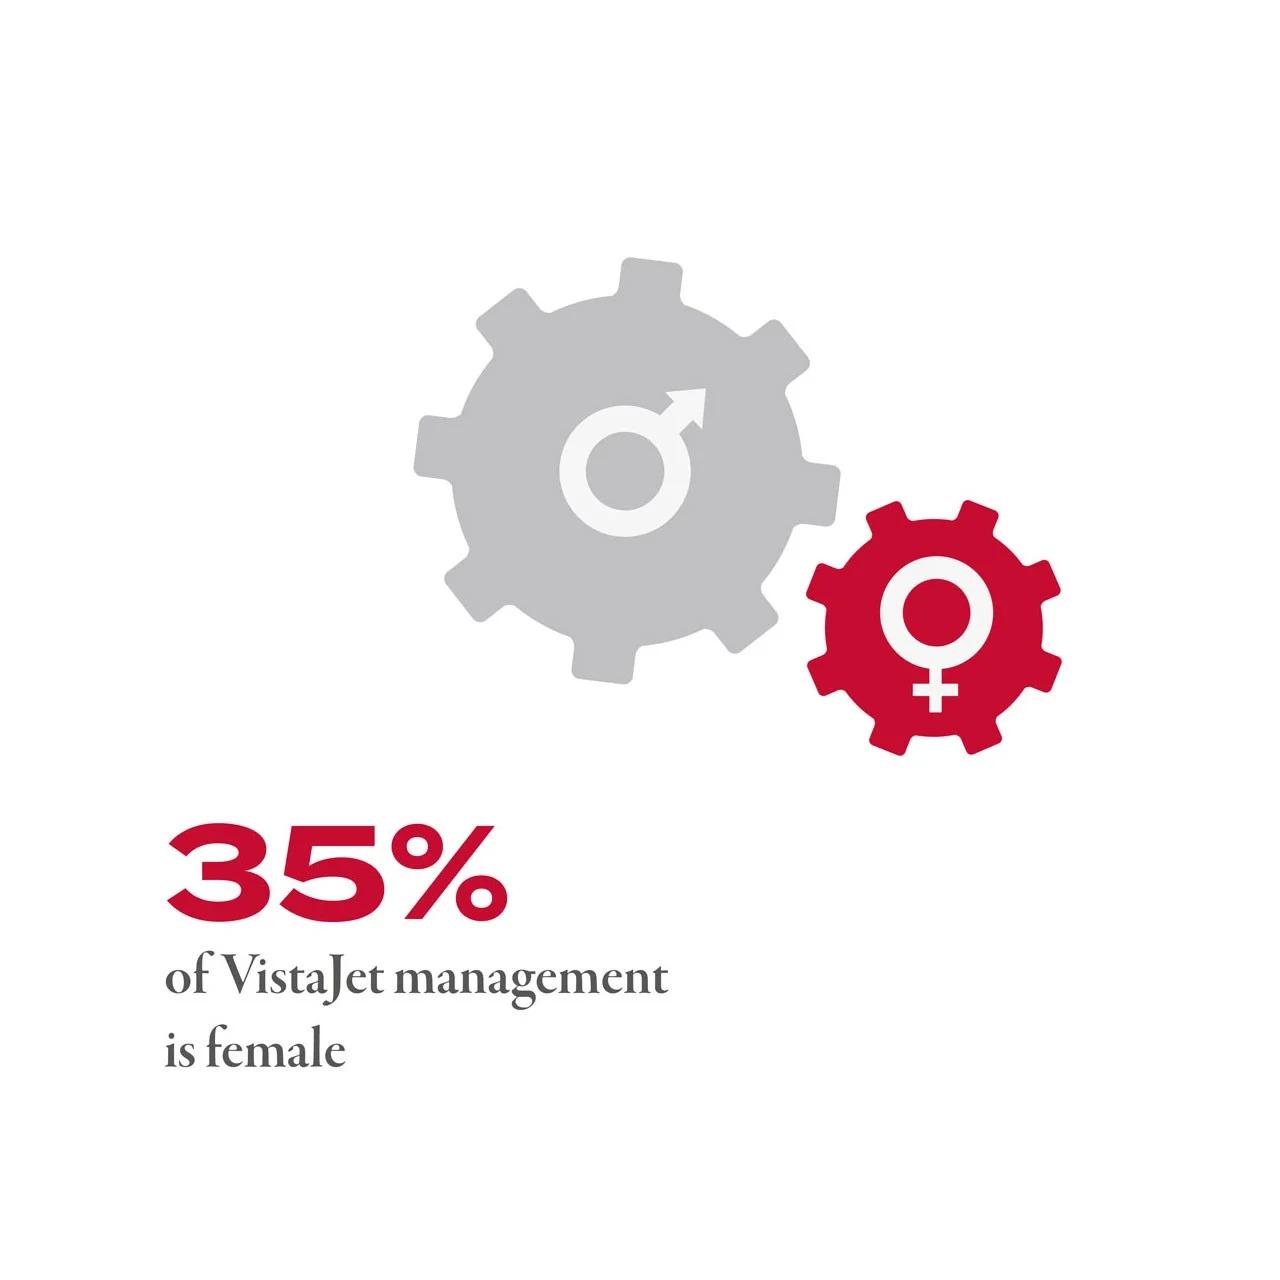 35% of VistaJet Management are Female